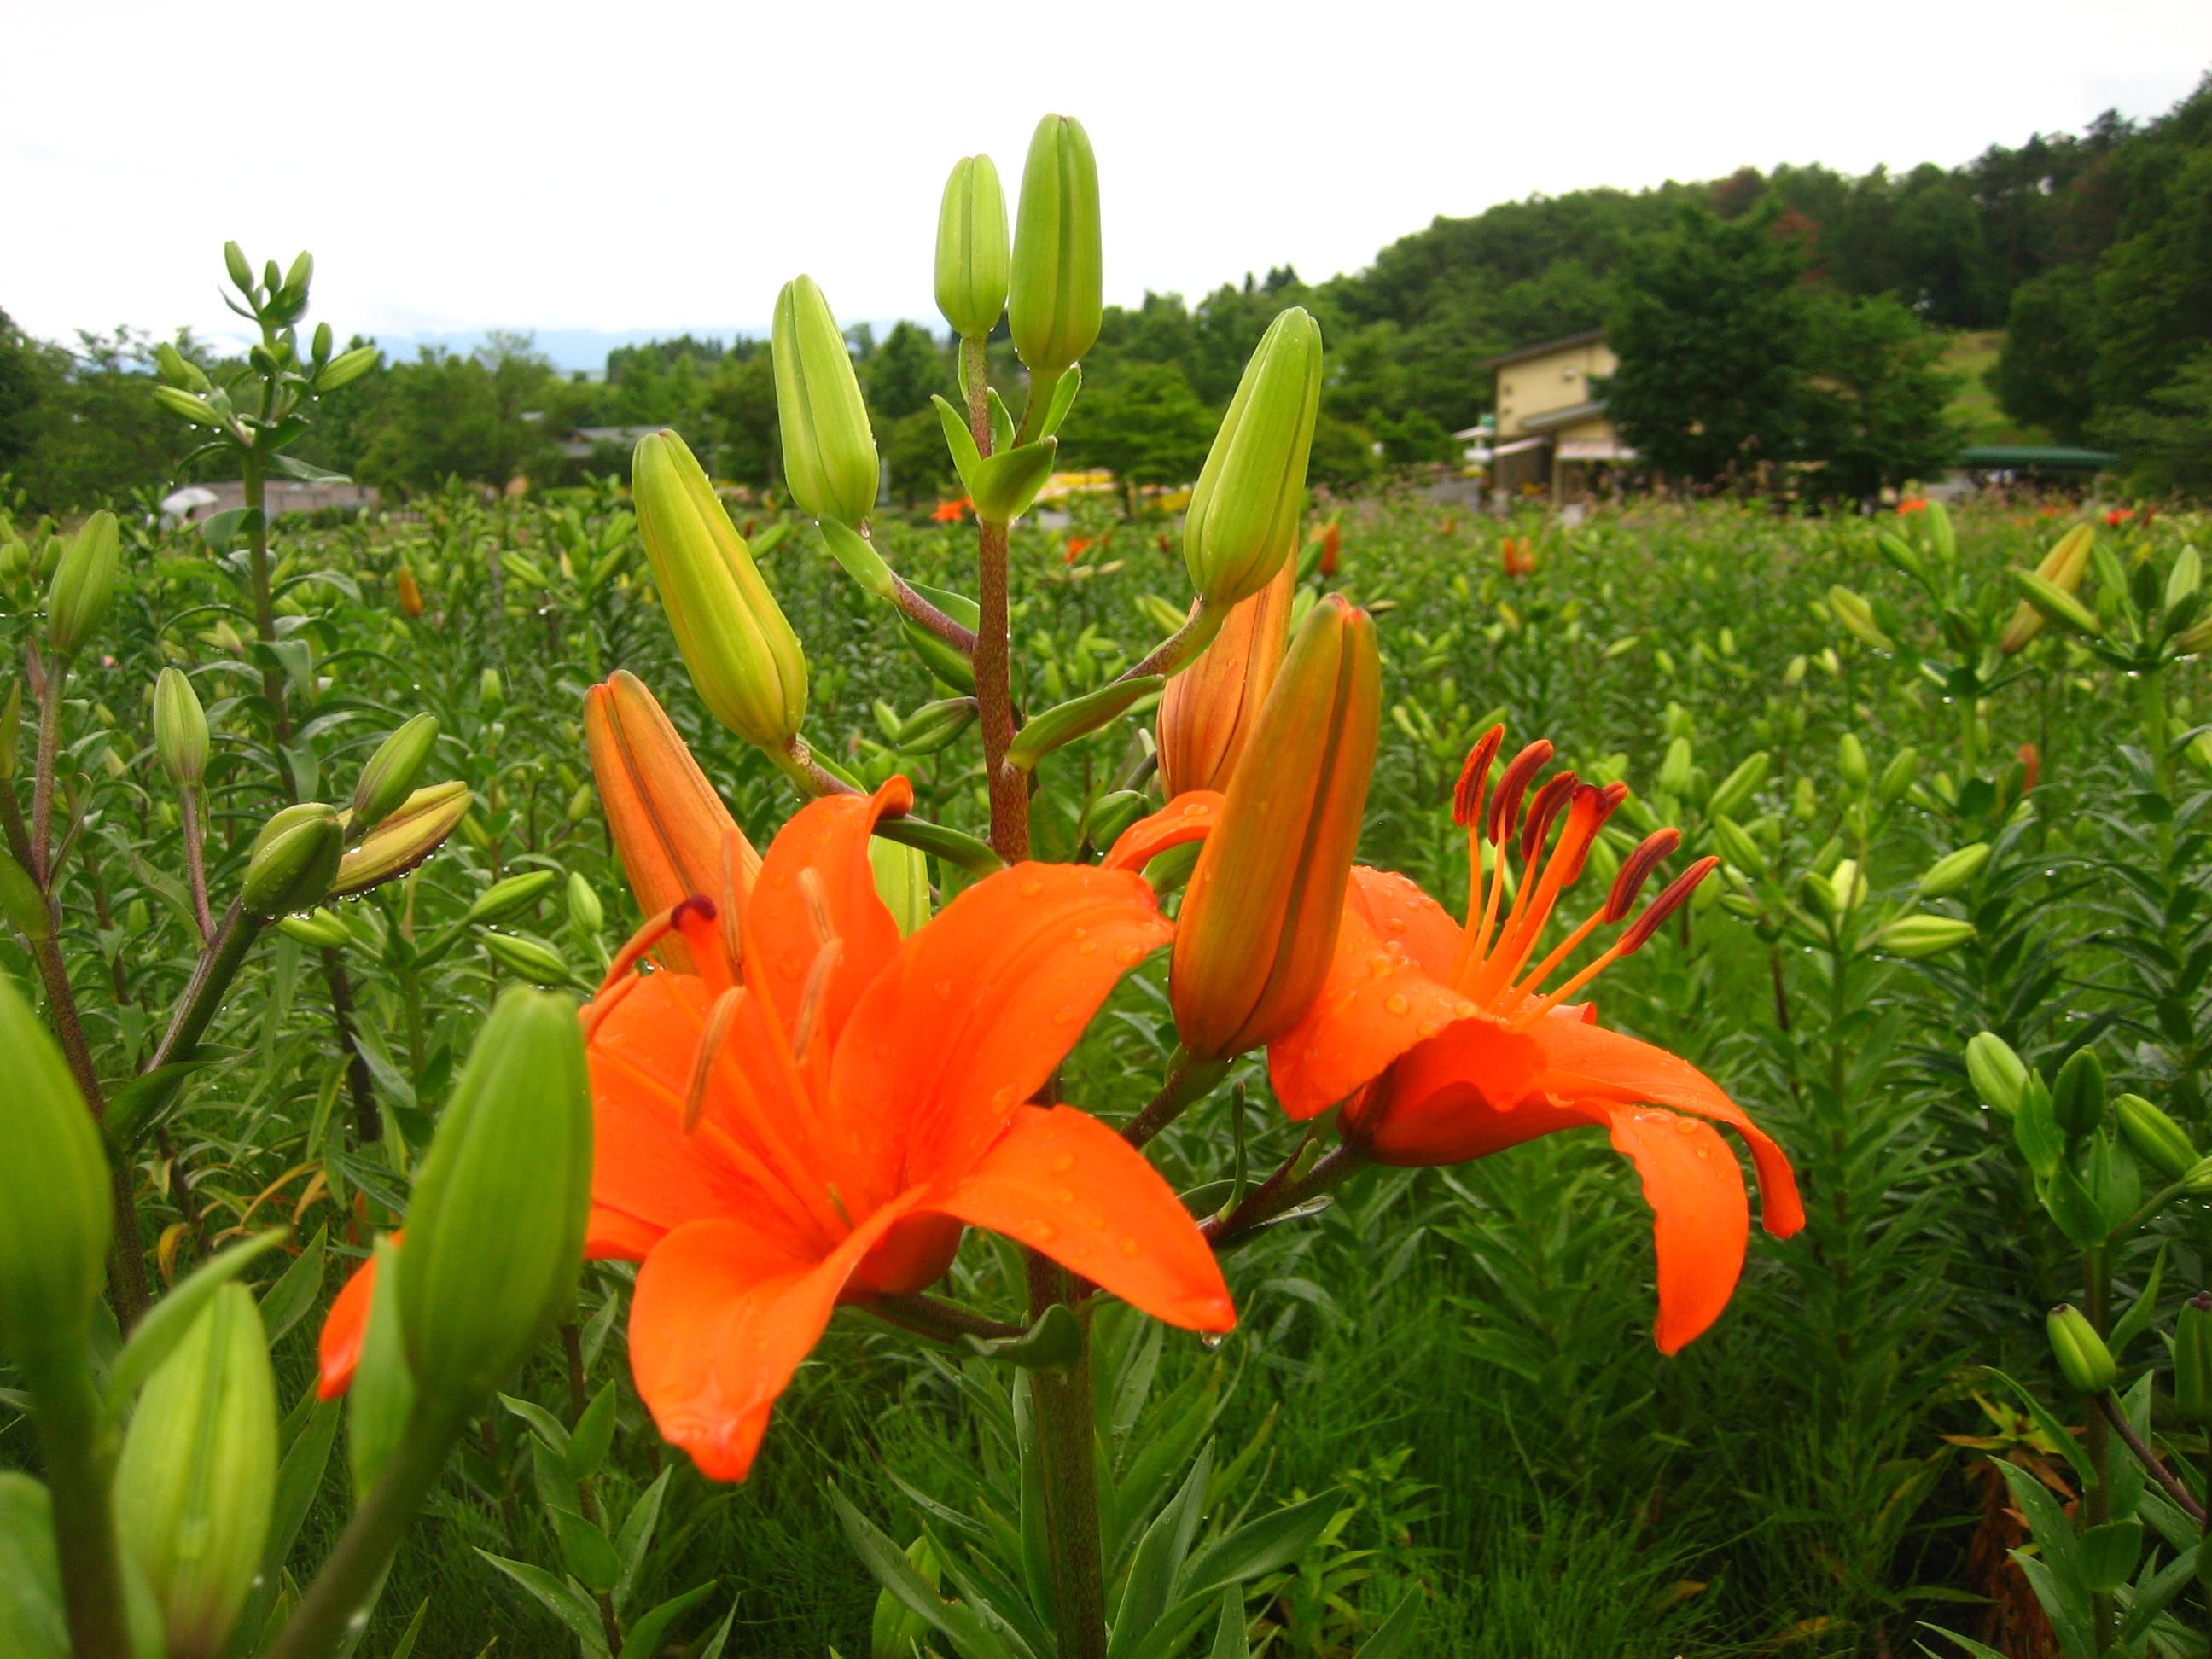 JR東日本駅からハイキング. ゆり香る町いいでと散居集落の田園風景トレッキングに行く:画像